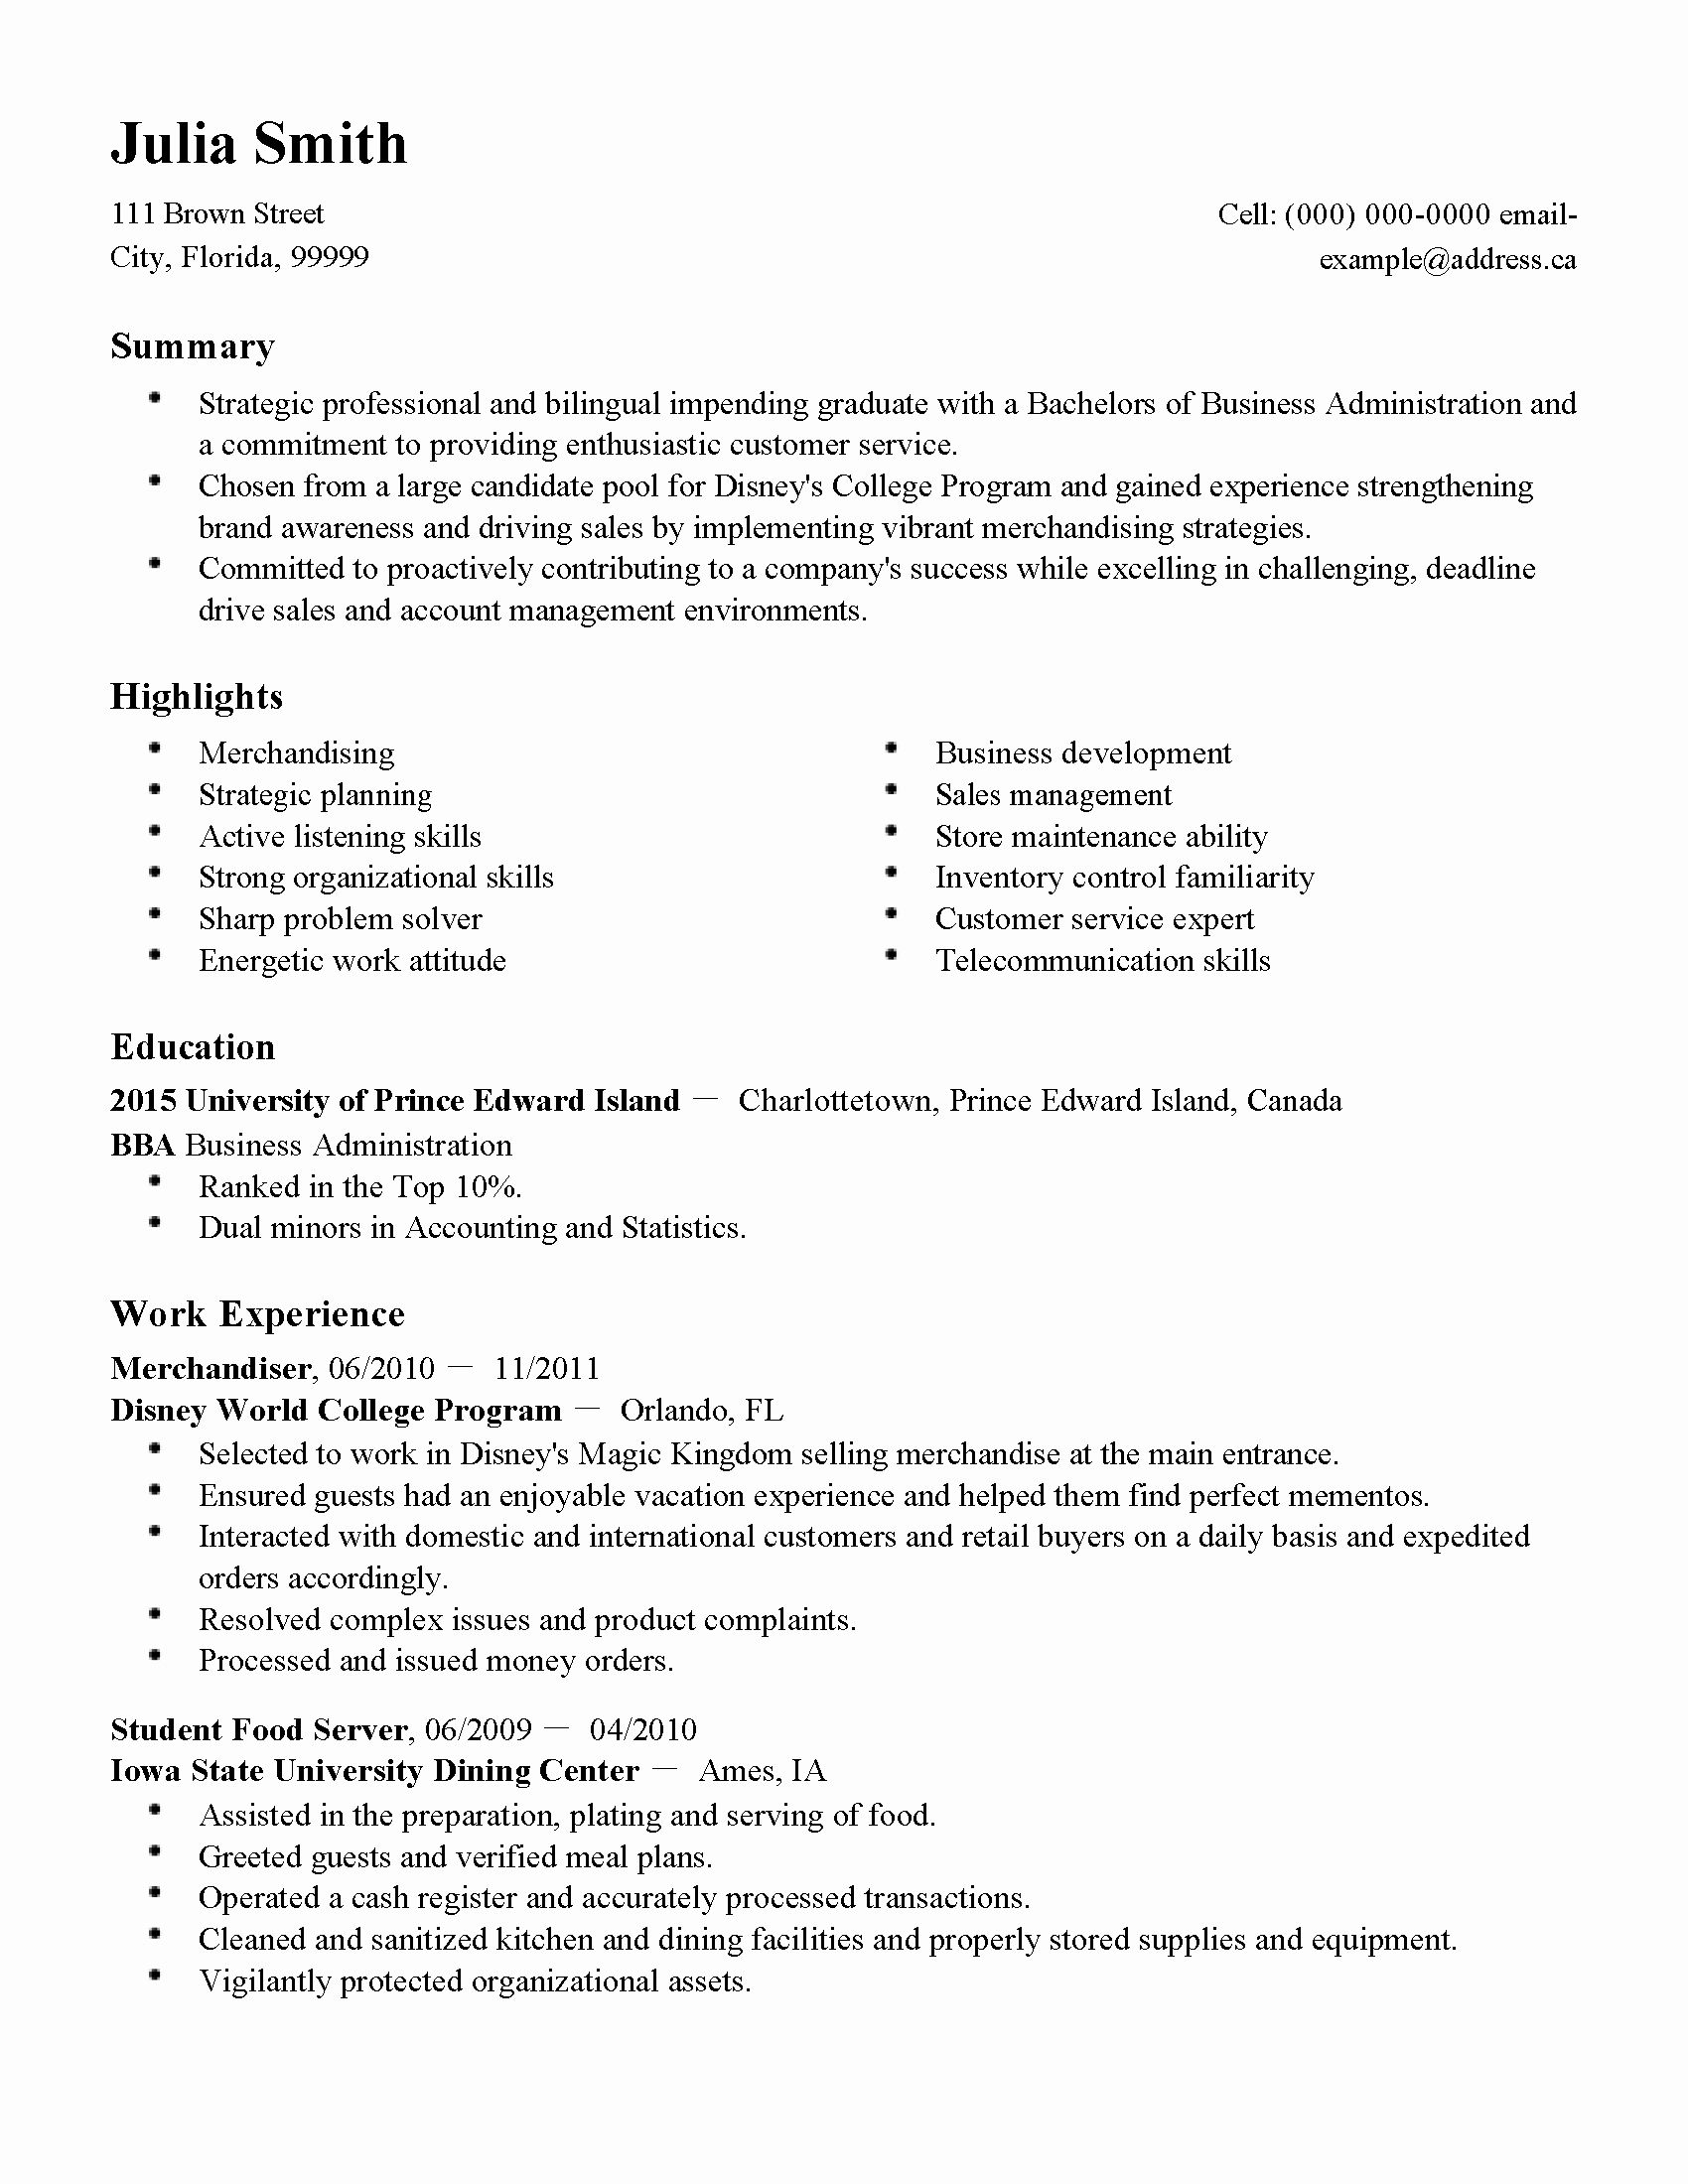 free resume templates without signing up freeresumetemplates